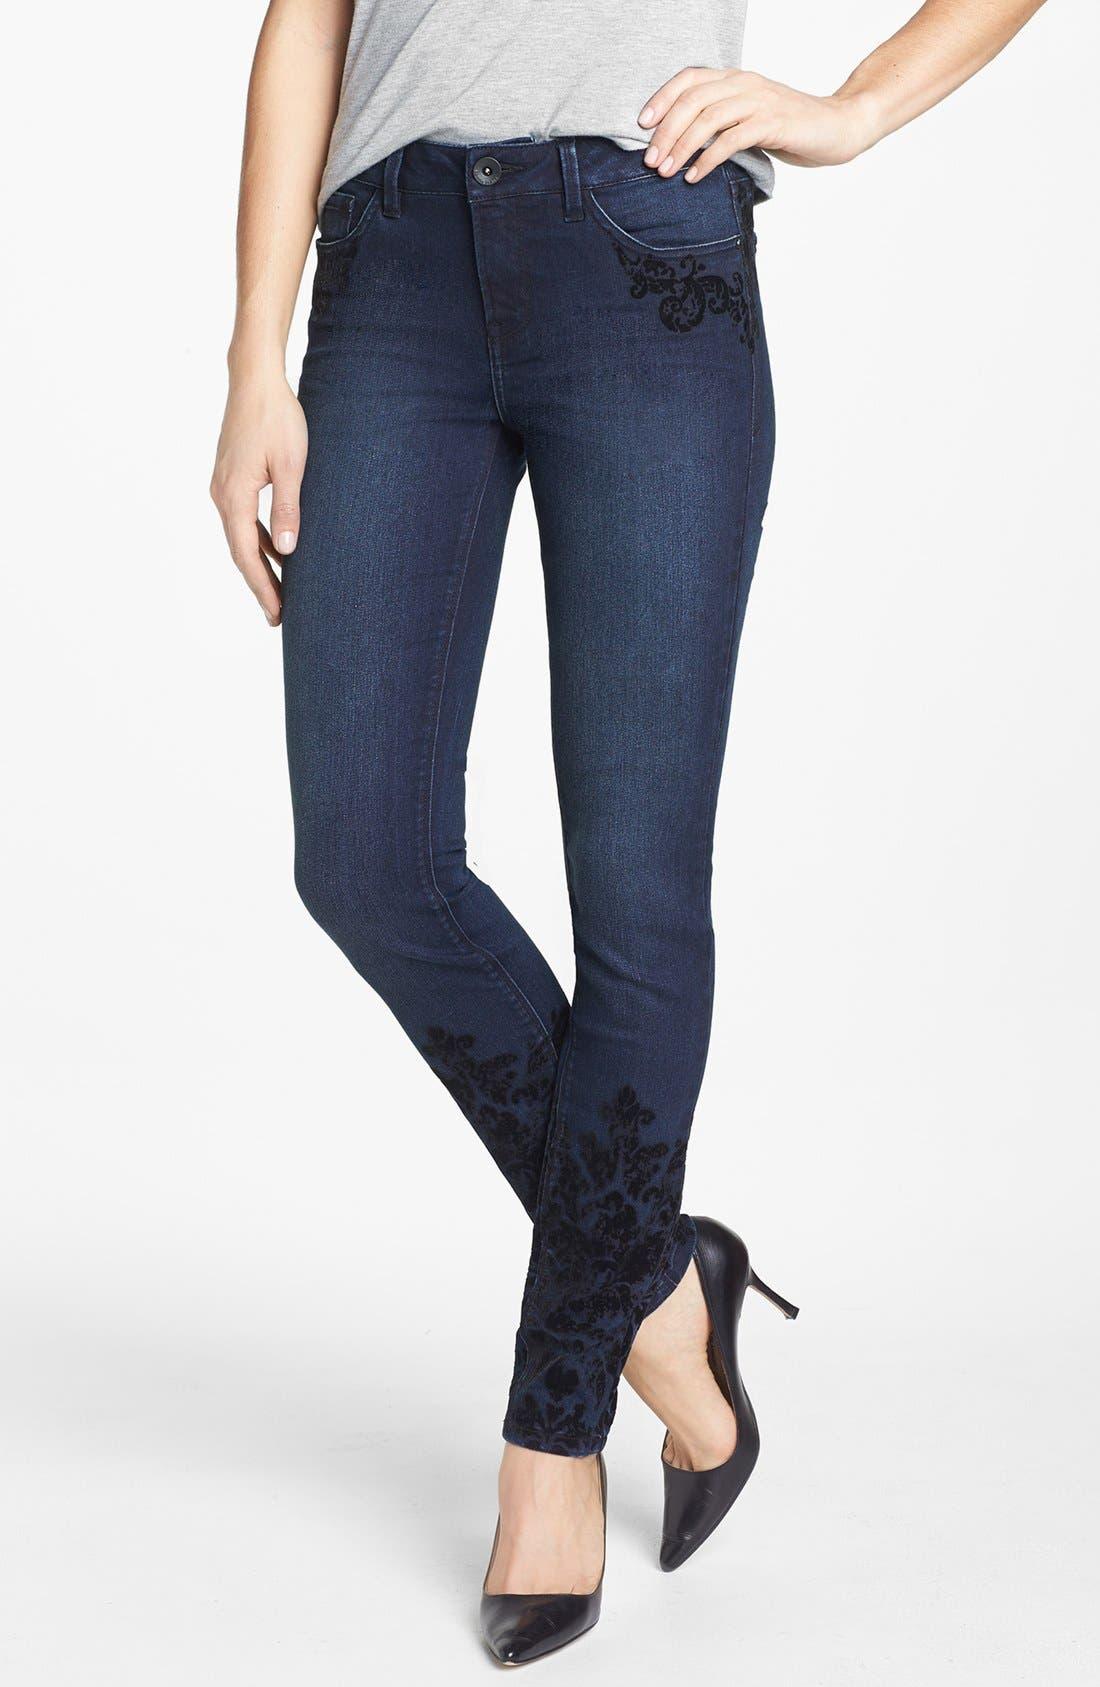 Main Image - kensie 'Ankle Biter' Flocked Skinny Jeans (Midnight)